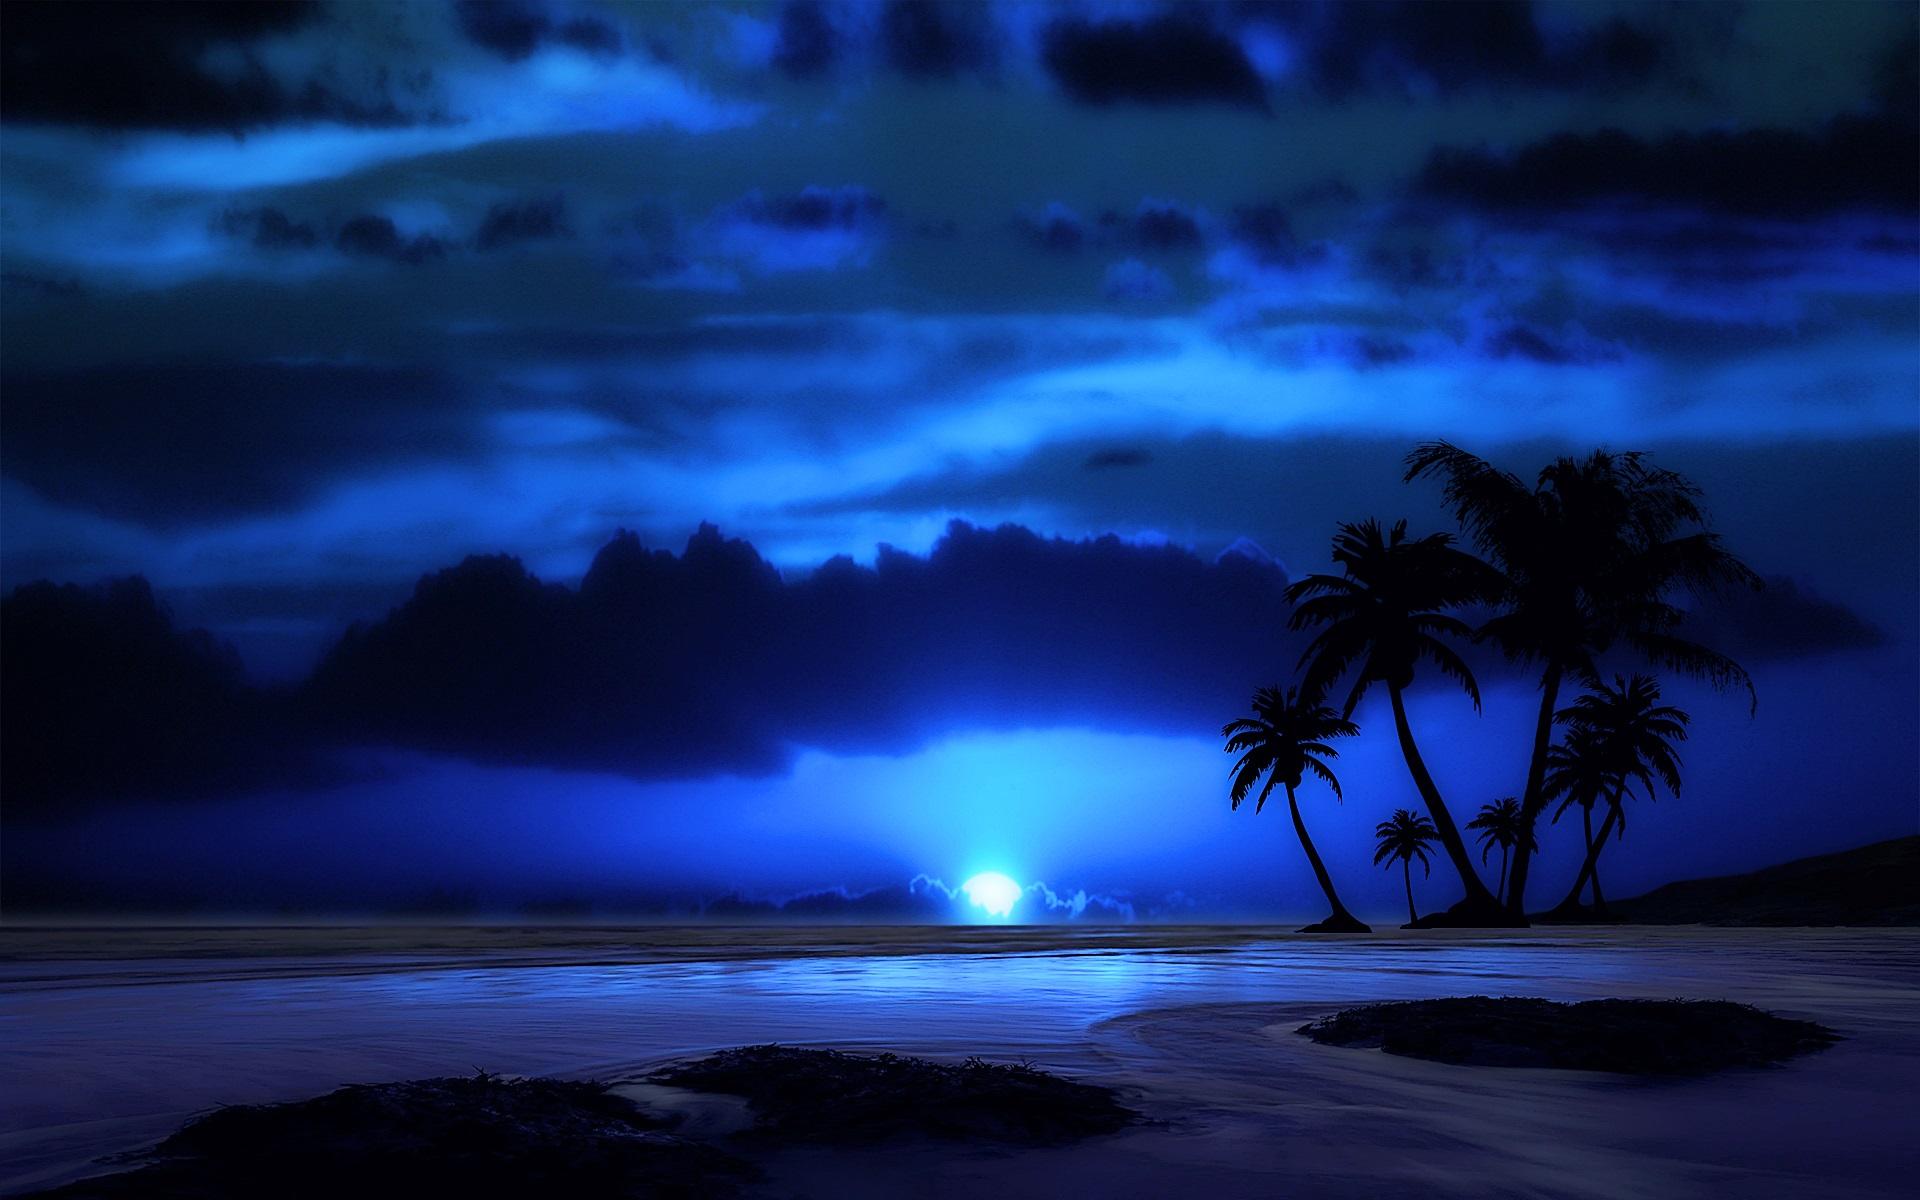 壁紙 夕方 夜 空 雲 海 熱帯 椰子の木 月 1920x1200 Hd 無料の